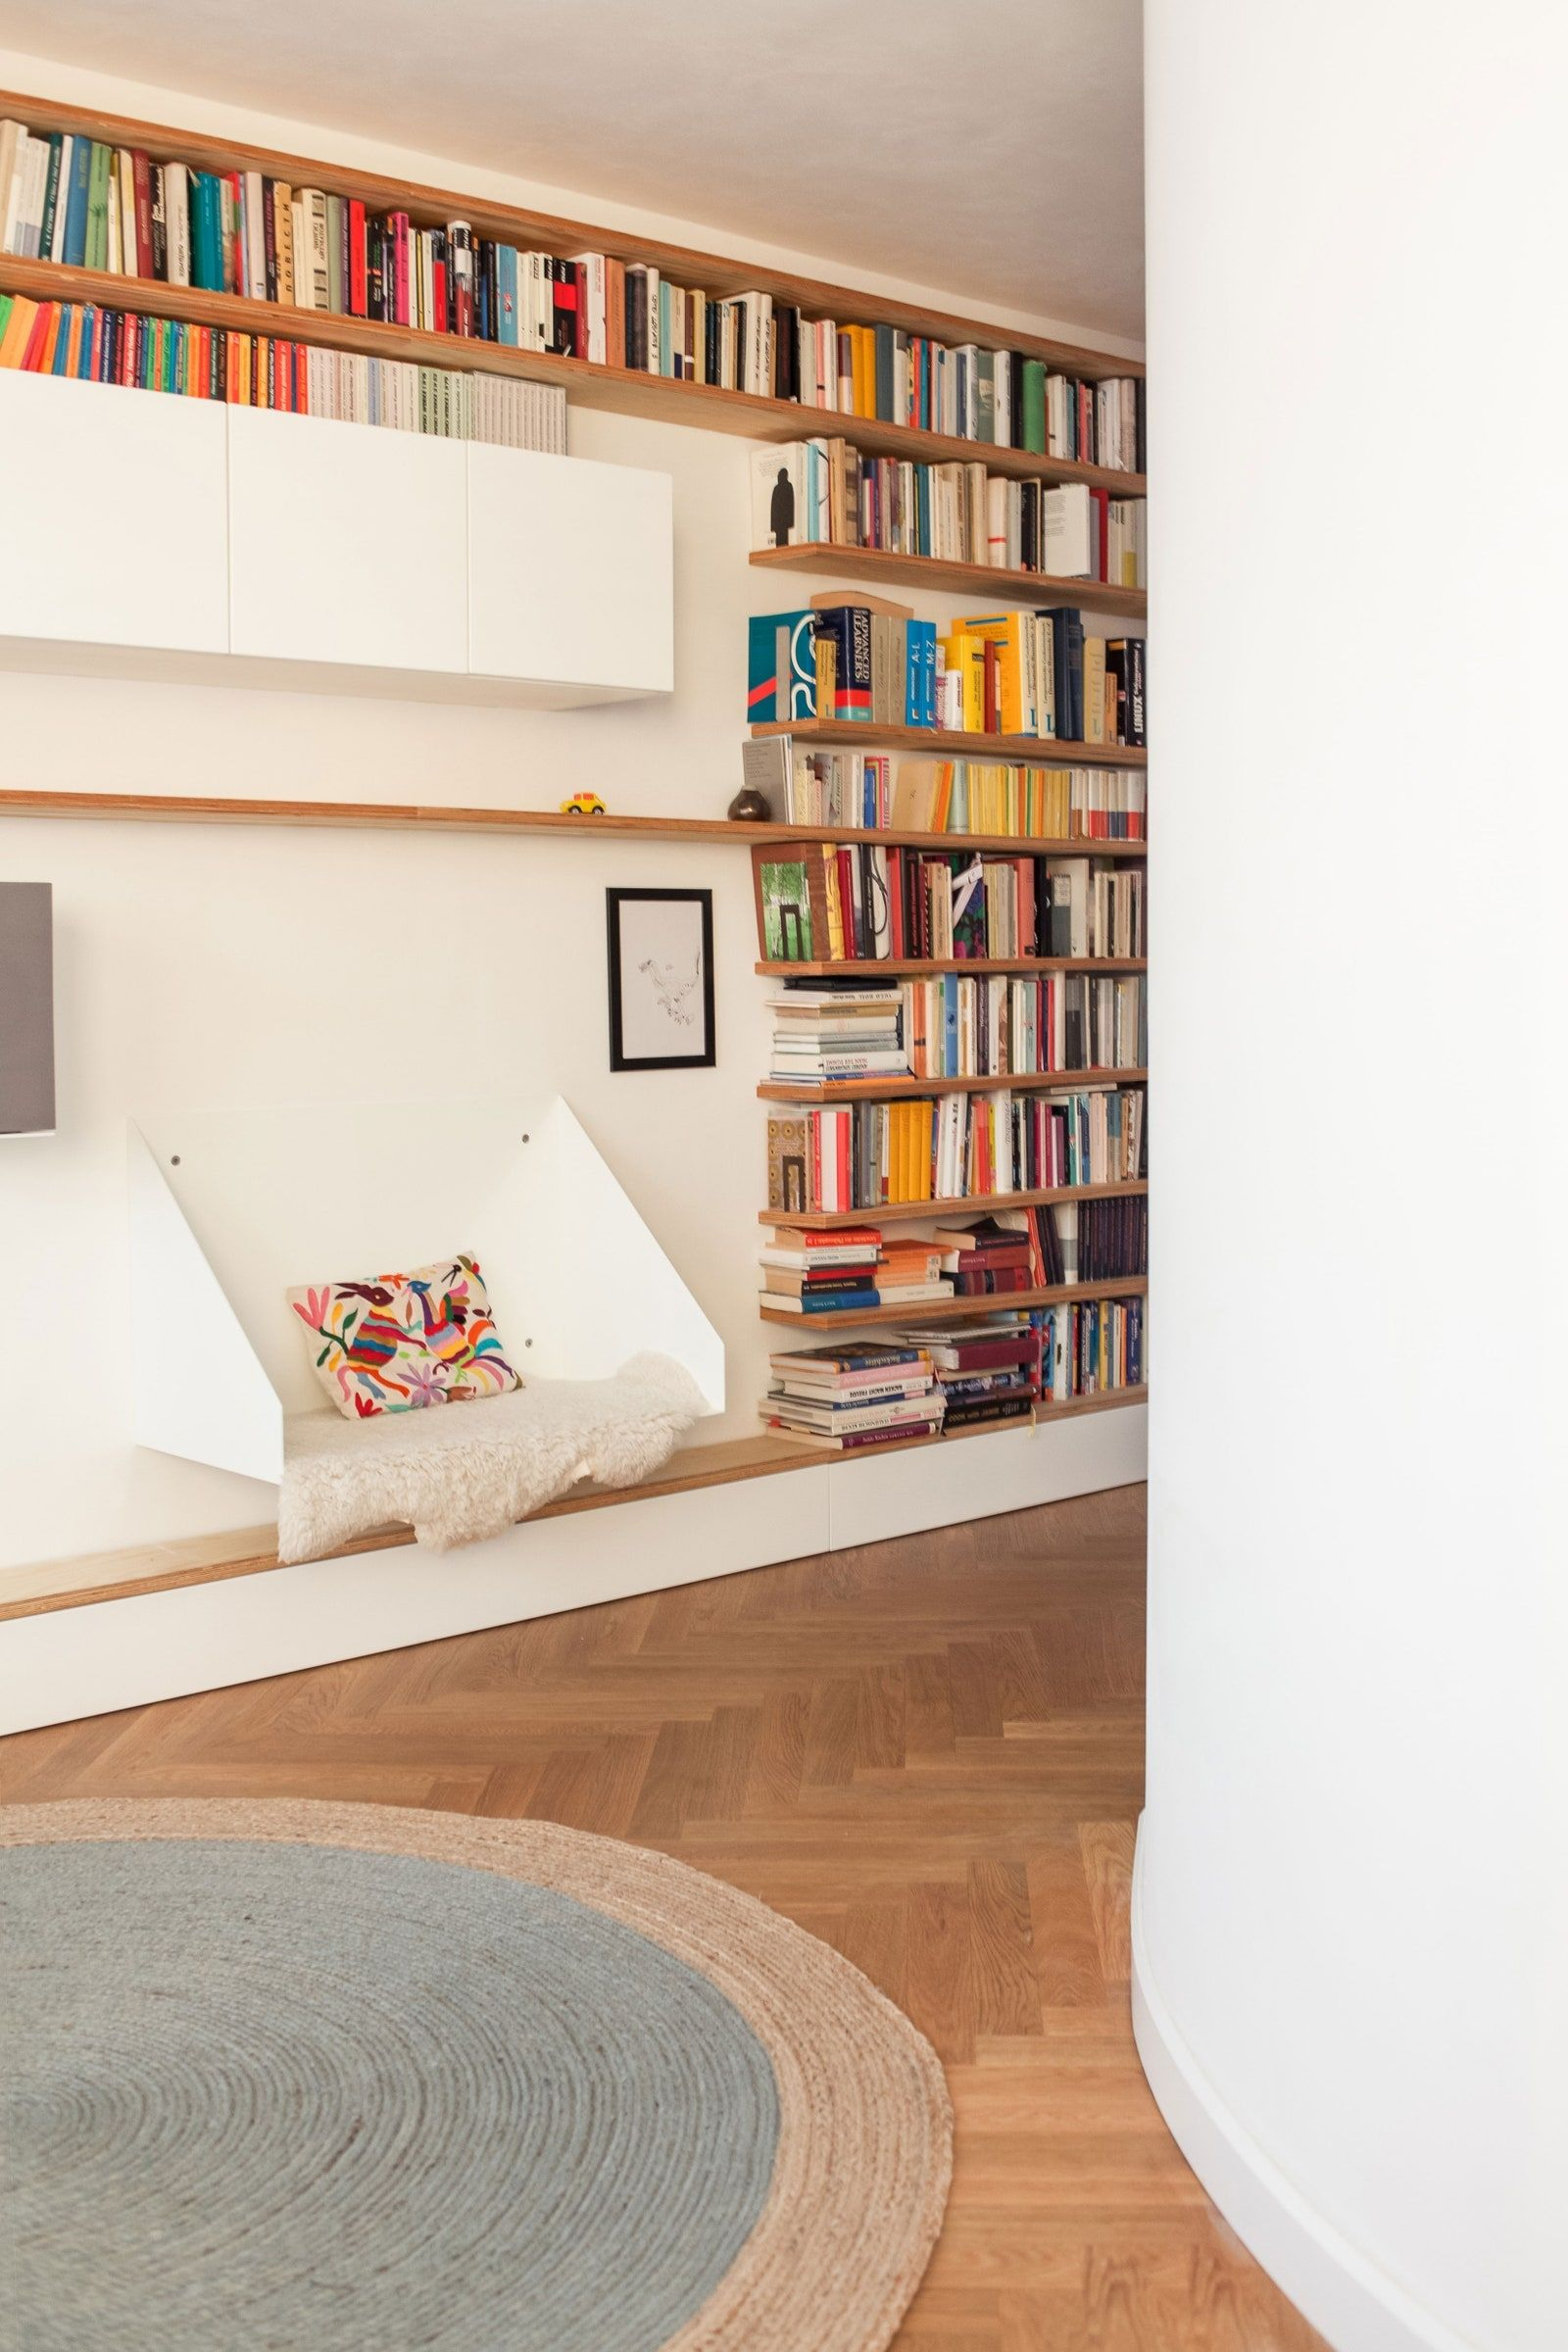 20 Genius Storage Ideas For Small Spaces In 2020 Small Li